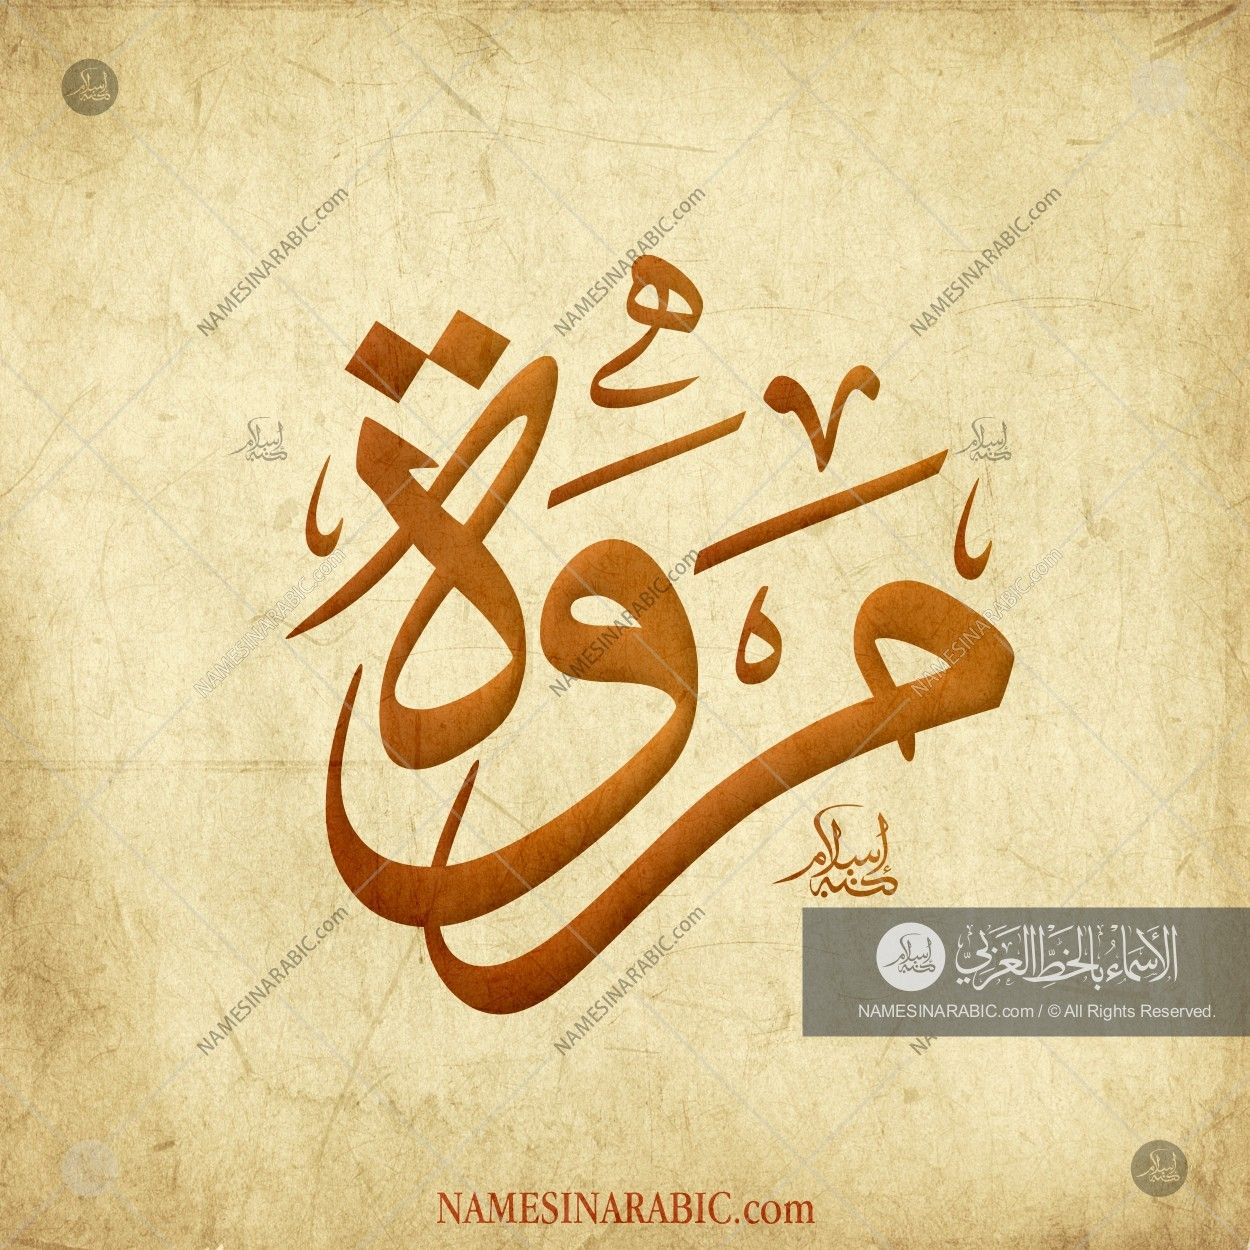 Marwah مروة Names In Arabic Calligraphy Name 2790 Calligraphy Name Islamic Art Calligraphy Arabic Calligraphy Art